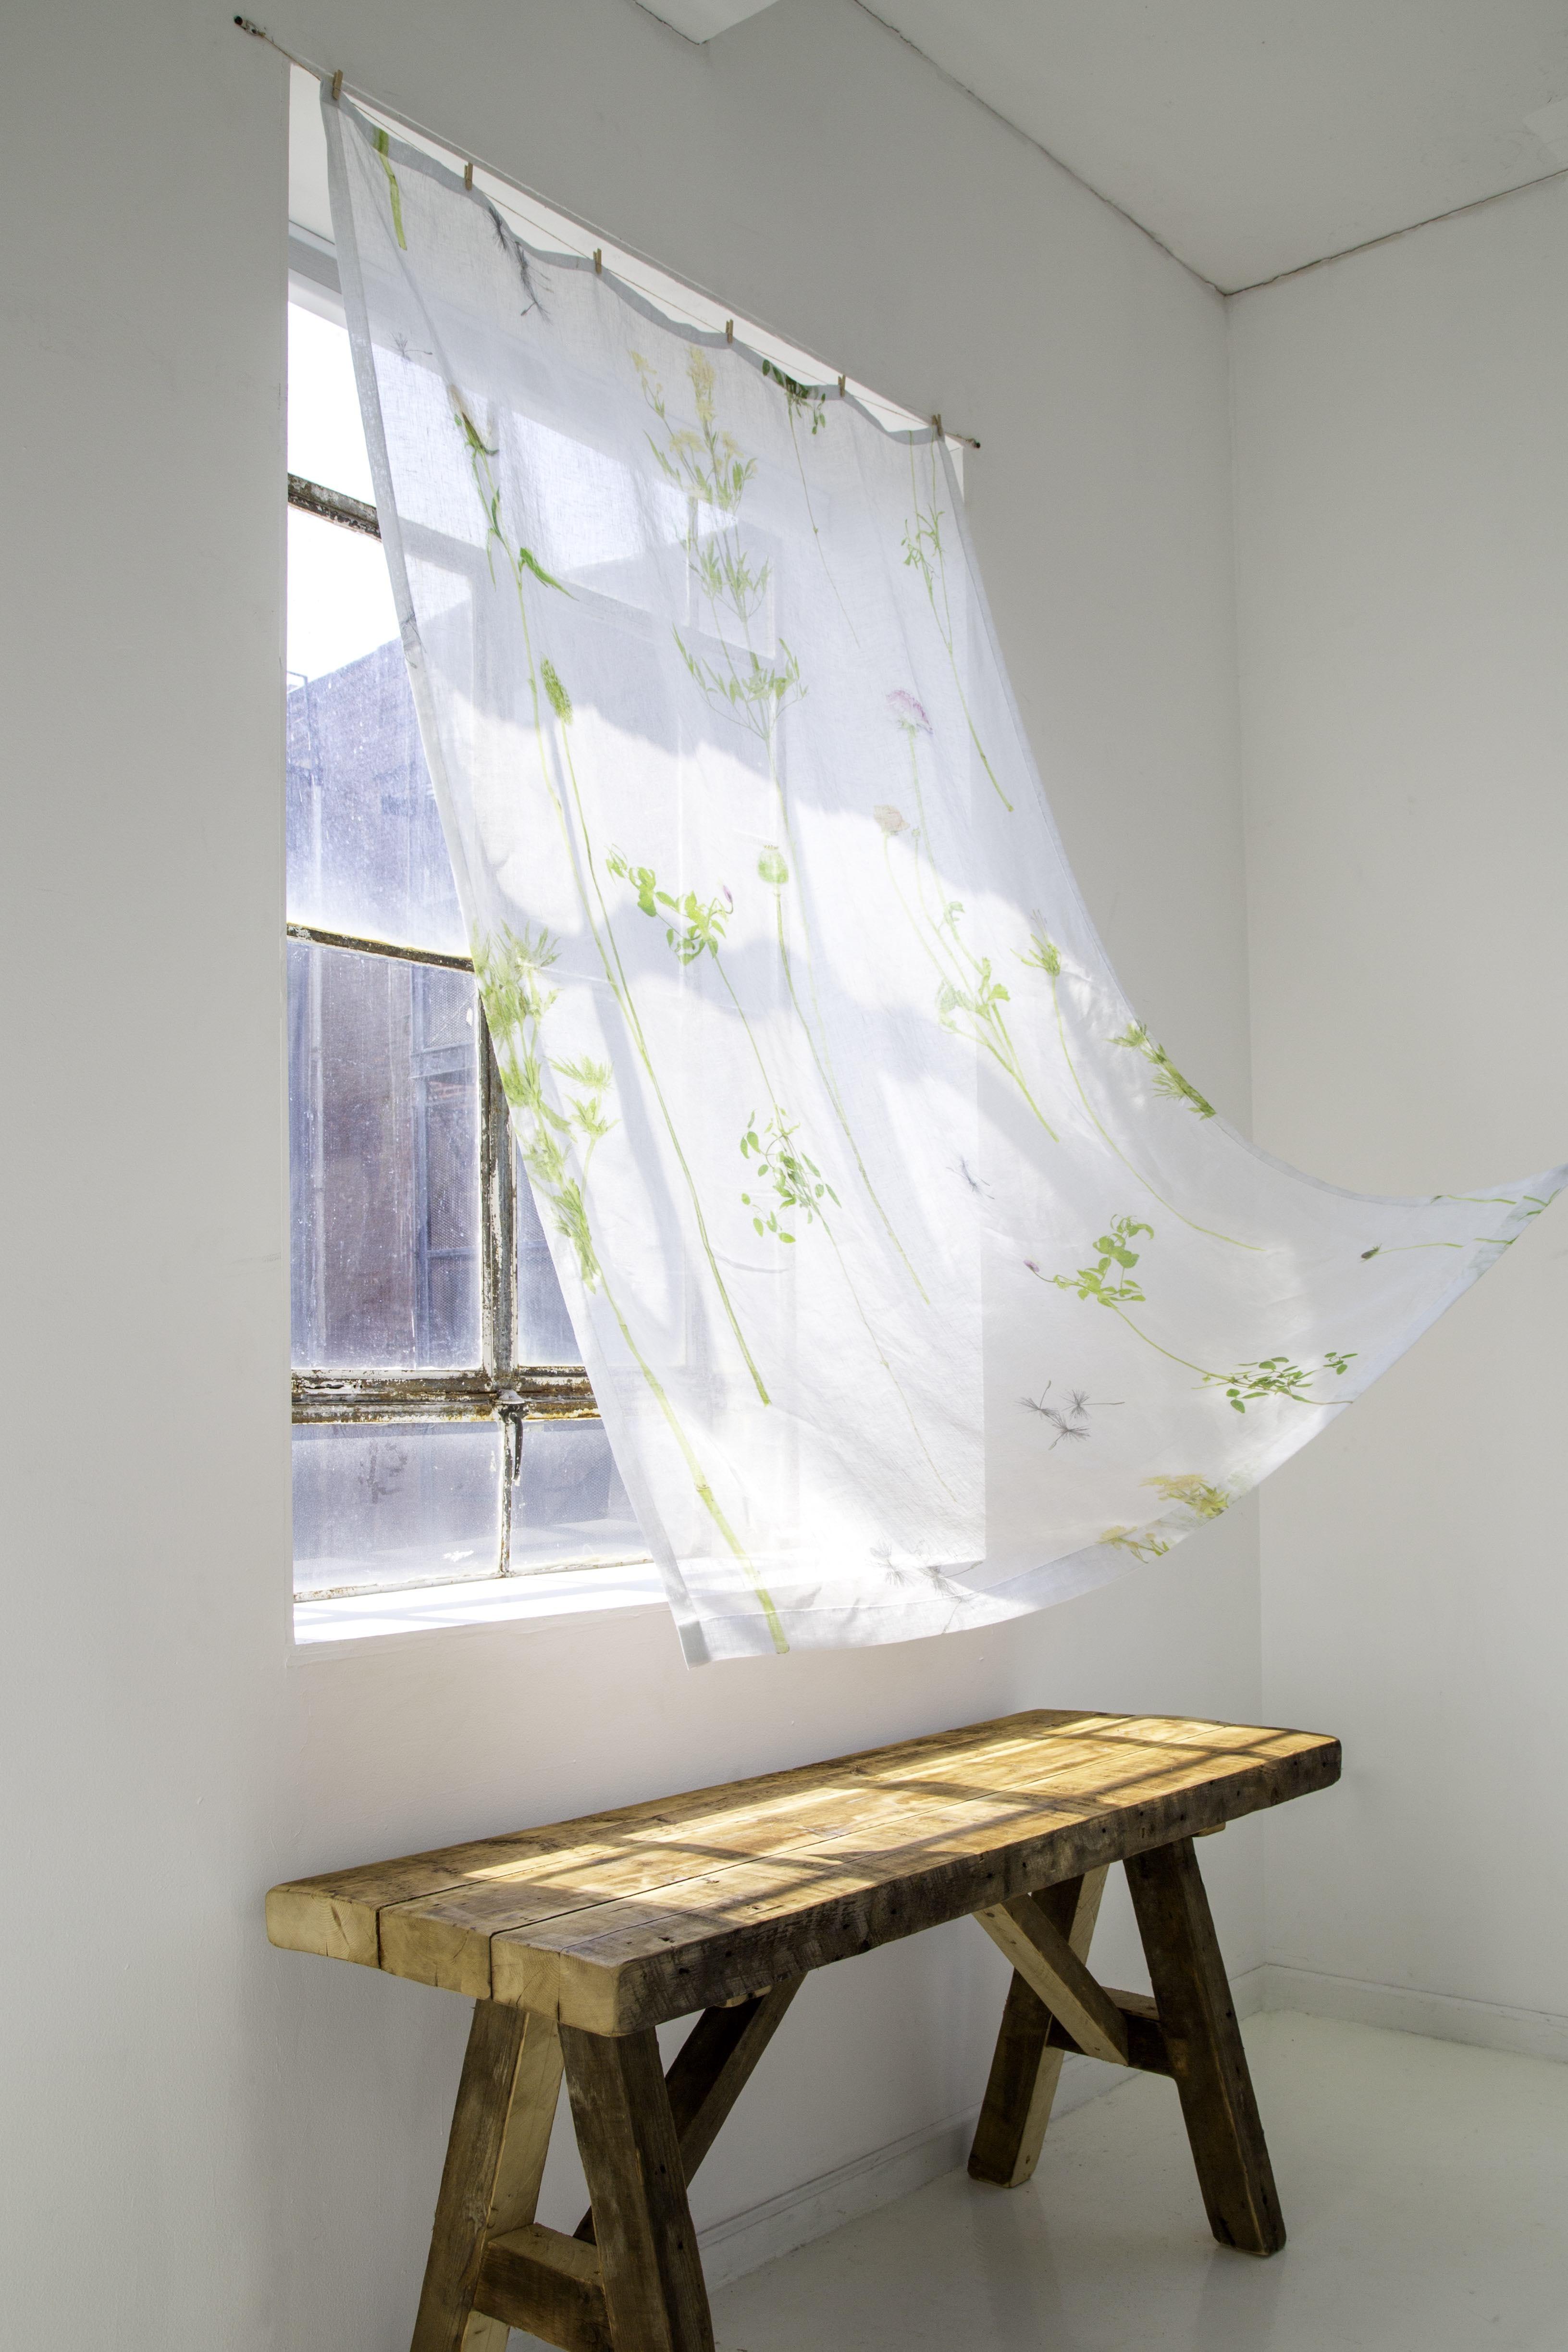 FloraWildflower 1 (credit Cope)